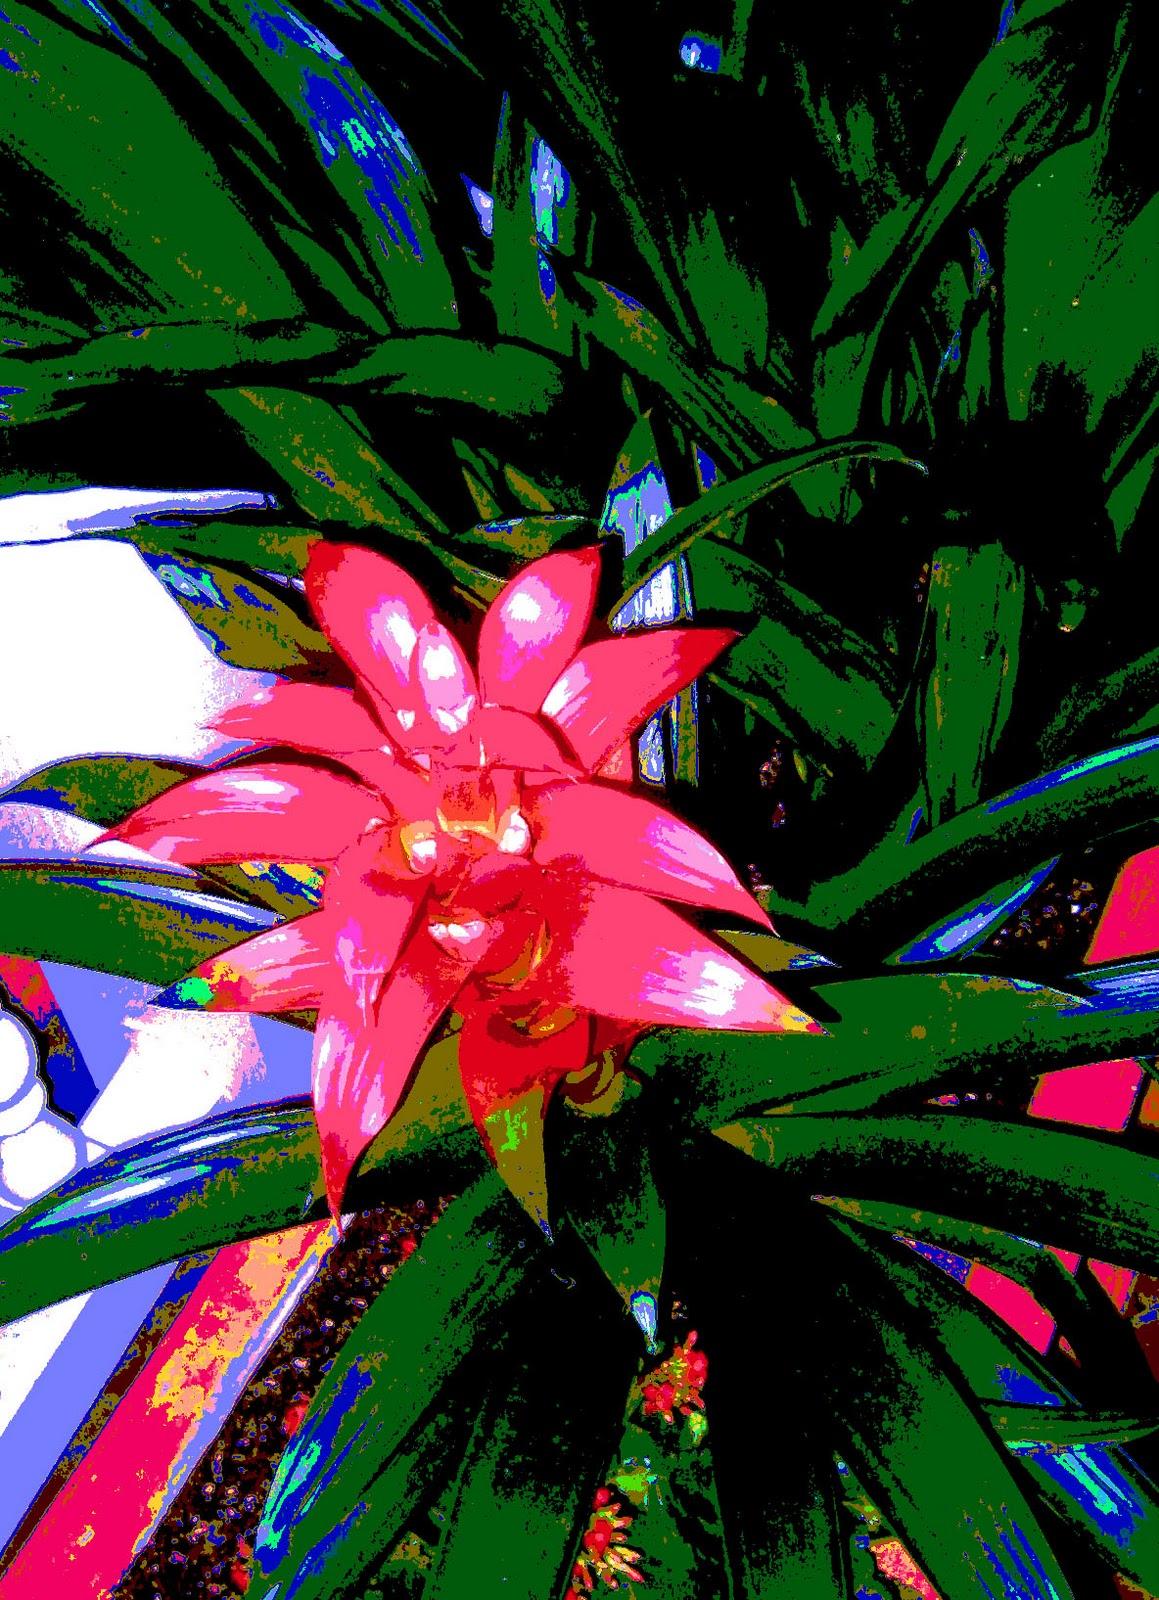 http://4.bp.blogspot.com/_5RAHn64AgY4/TSHzqJ2li8I/AAAAAAAADzo/tFsPfVORYyo/s1600/posterizedredflowerwithfiltersaturated.jpg